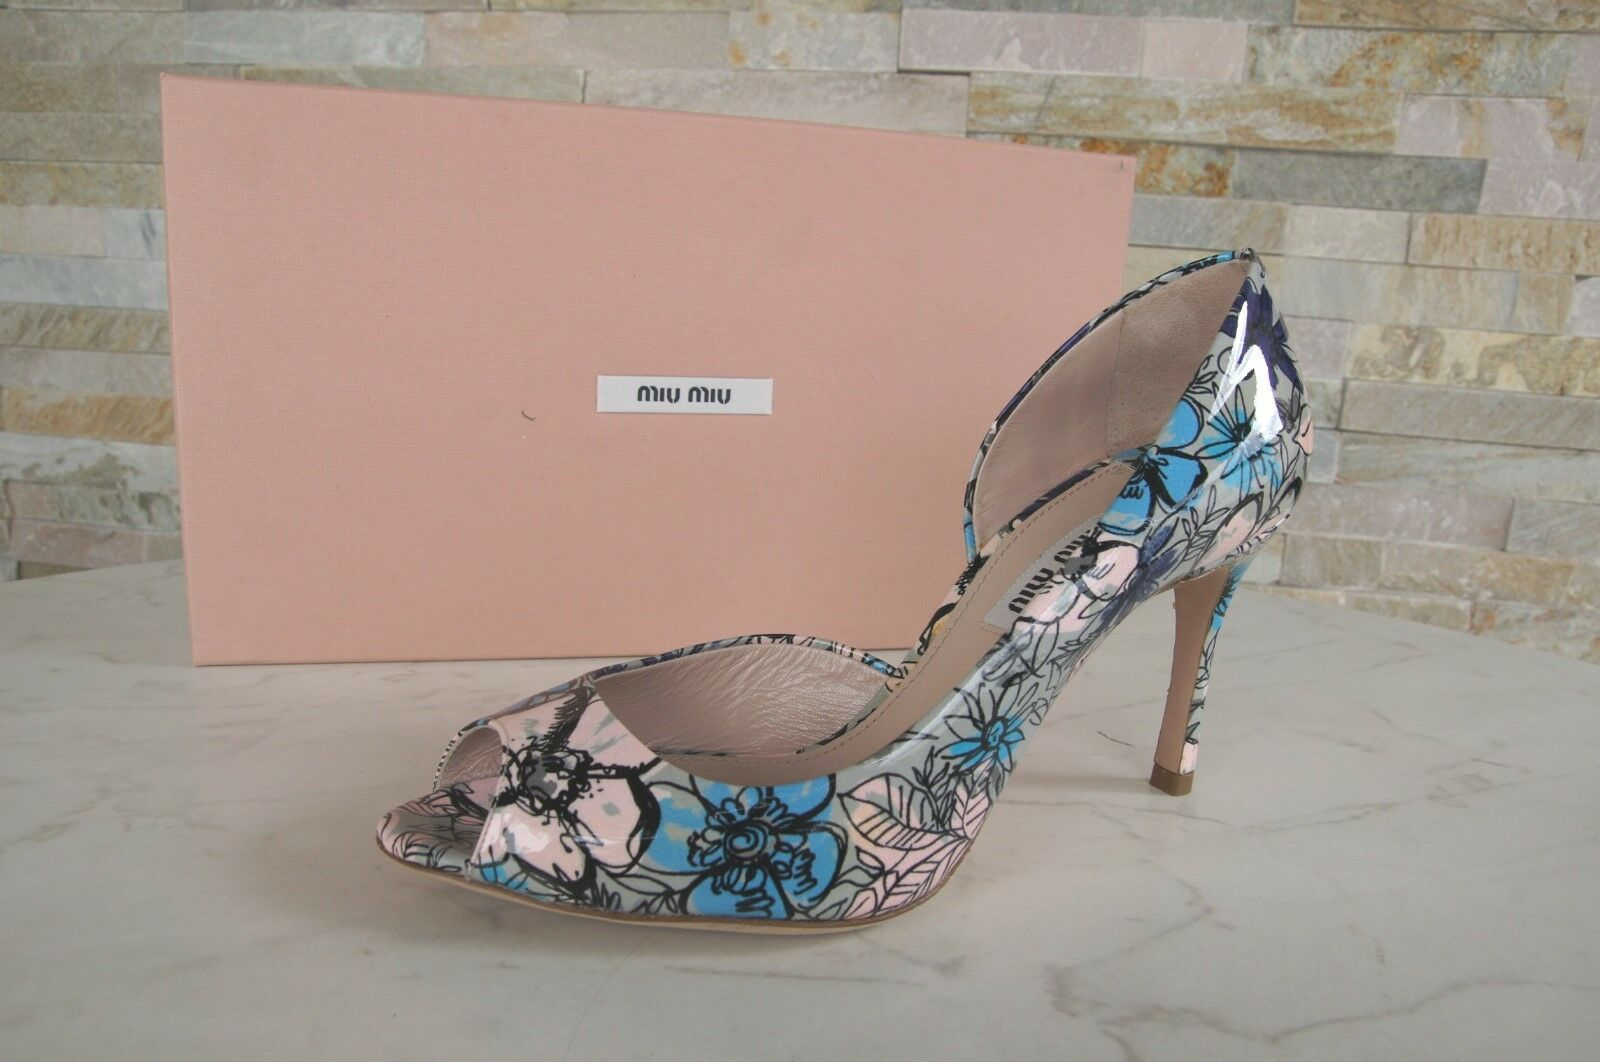 Miu Miu Prada Dimensione 36,5 Open  -Toes Peep -Toes Pumps scarpe Flowers New Precedentemente  sconto